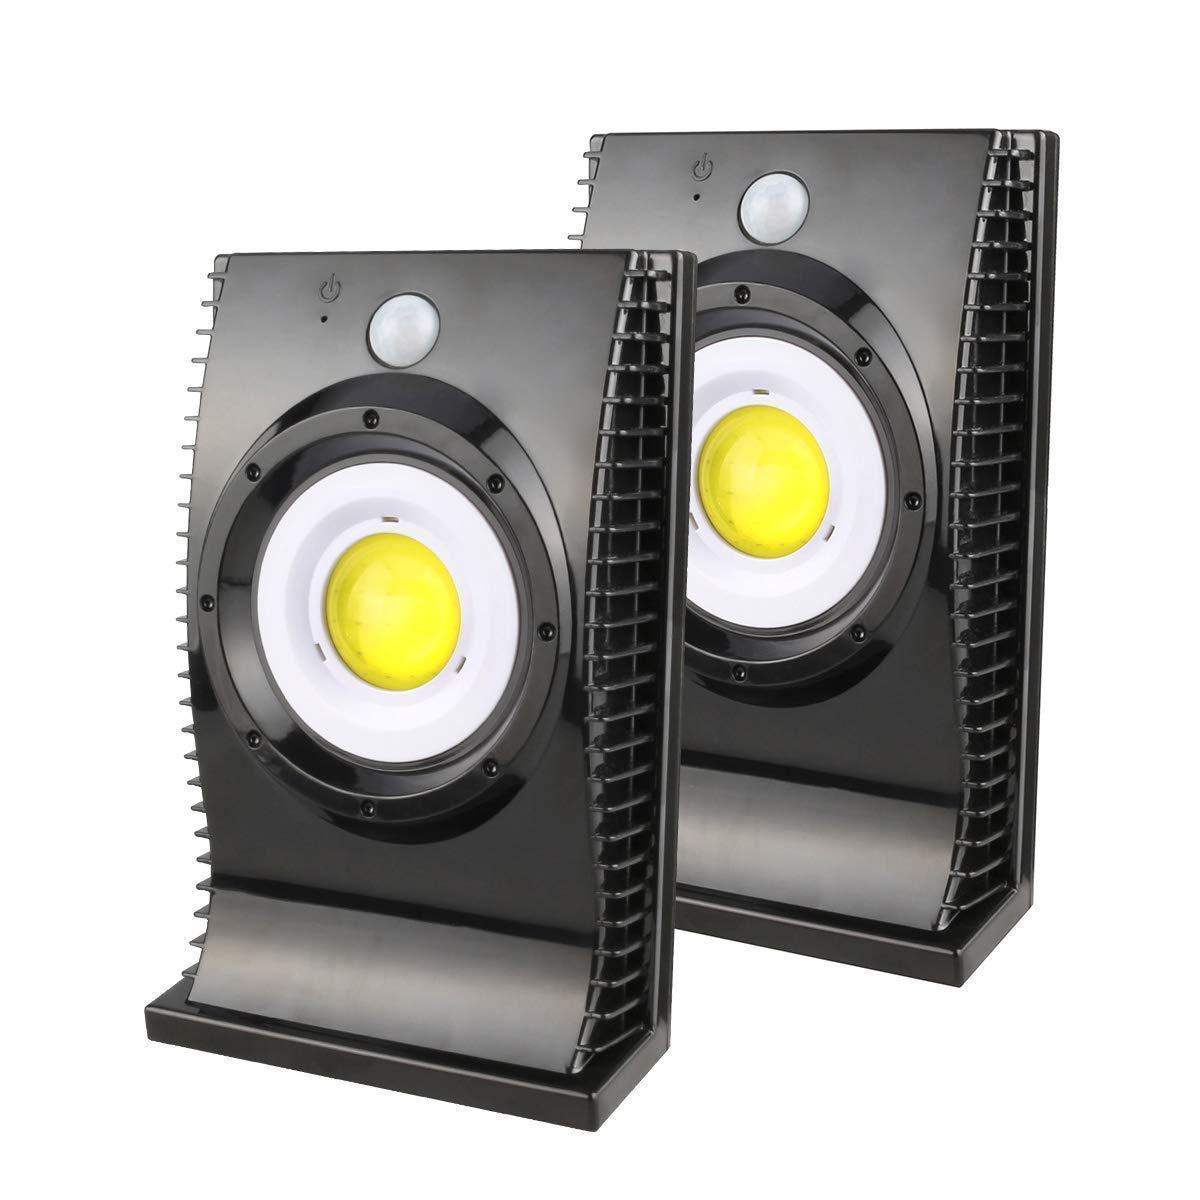 Solar Lights Outdoor, Solar Flood Light Outdoor 54 LED, Waterproof IP 65 LED Flood Light for Garden Garage Lawn Pool Fencing Pathway (1 Pack)